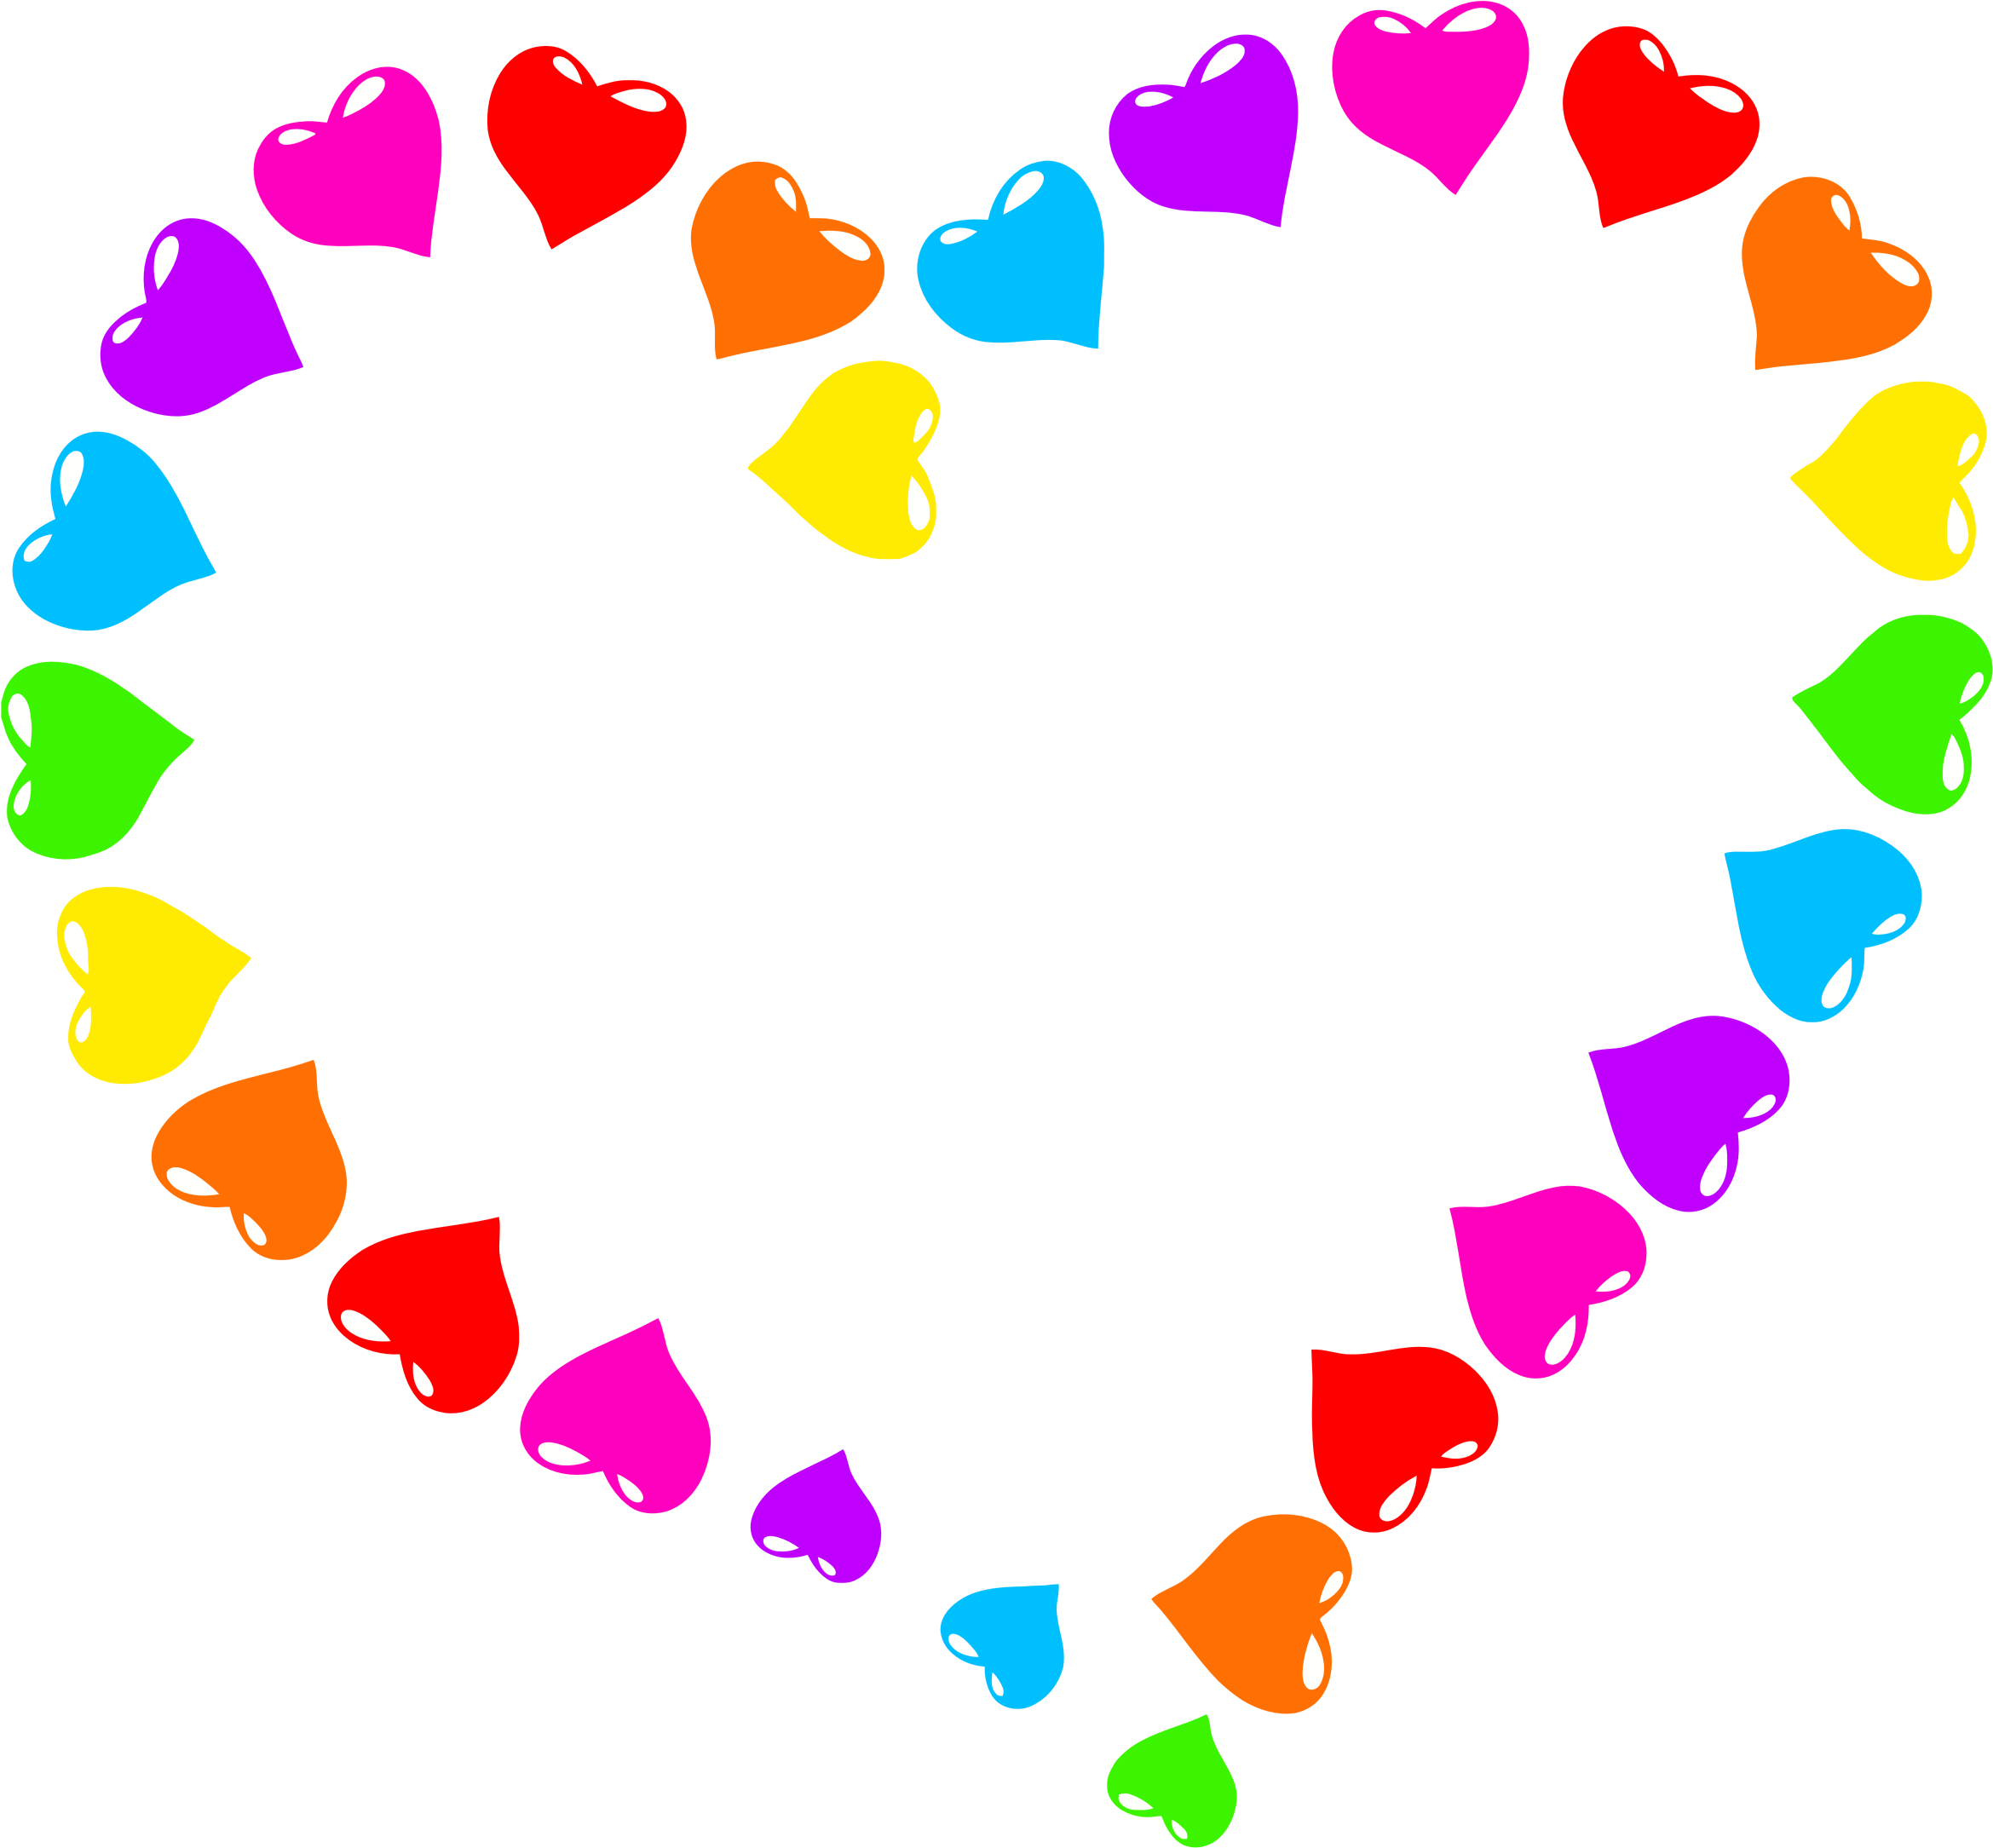 Rainbow heart clipart image transparent Clipart - Rainbow Heart image transparent